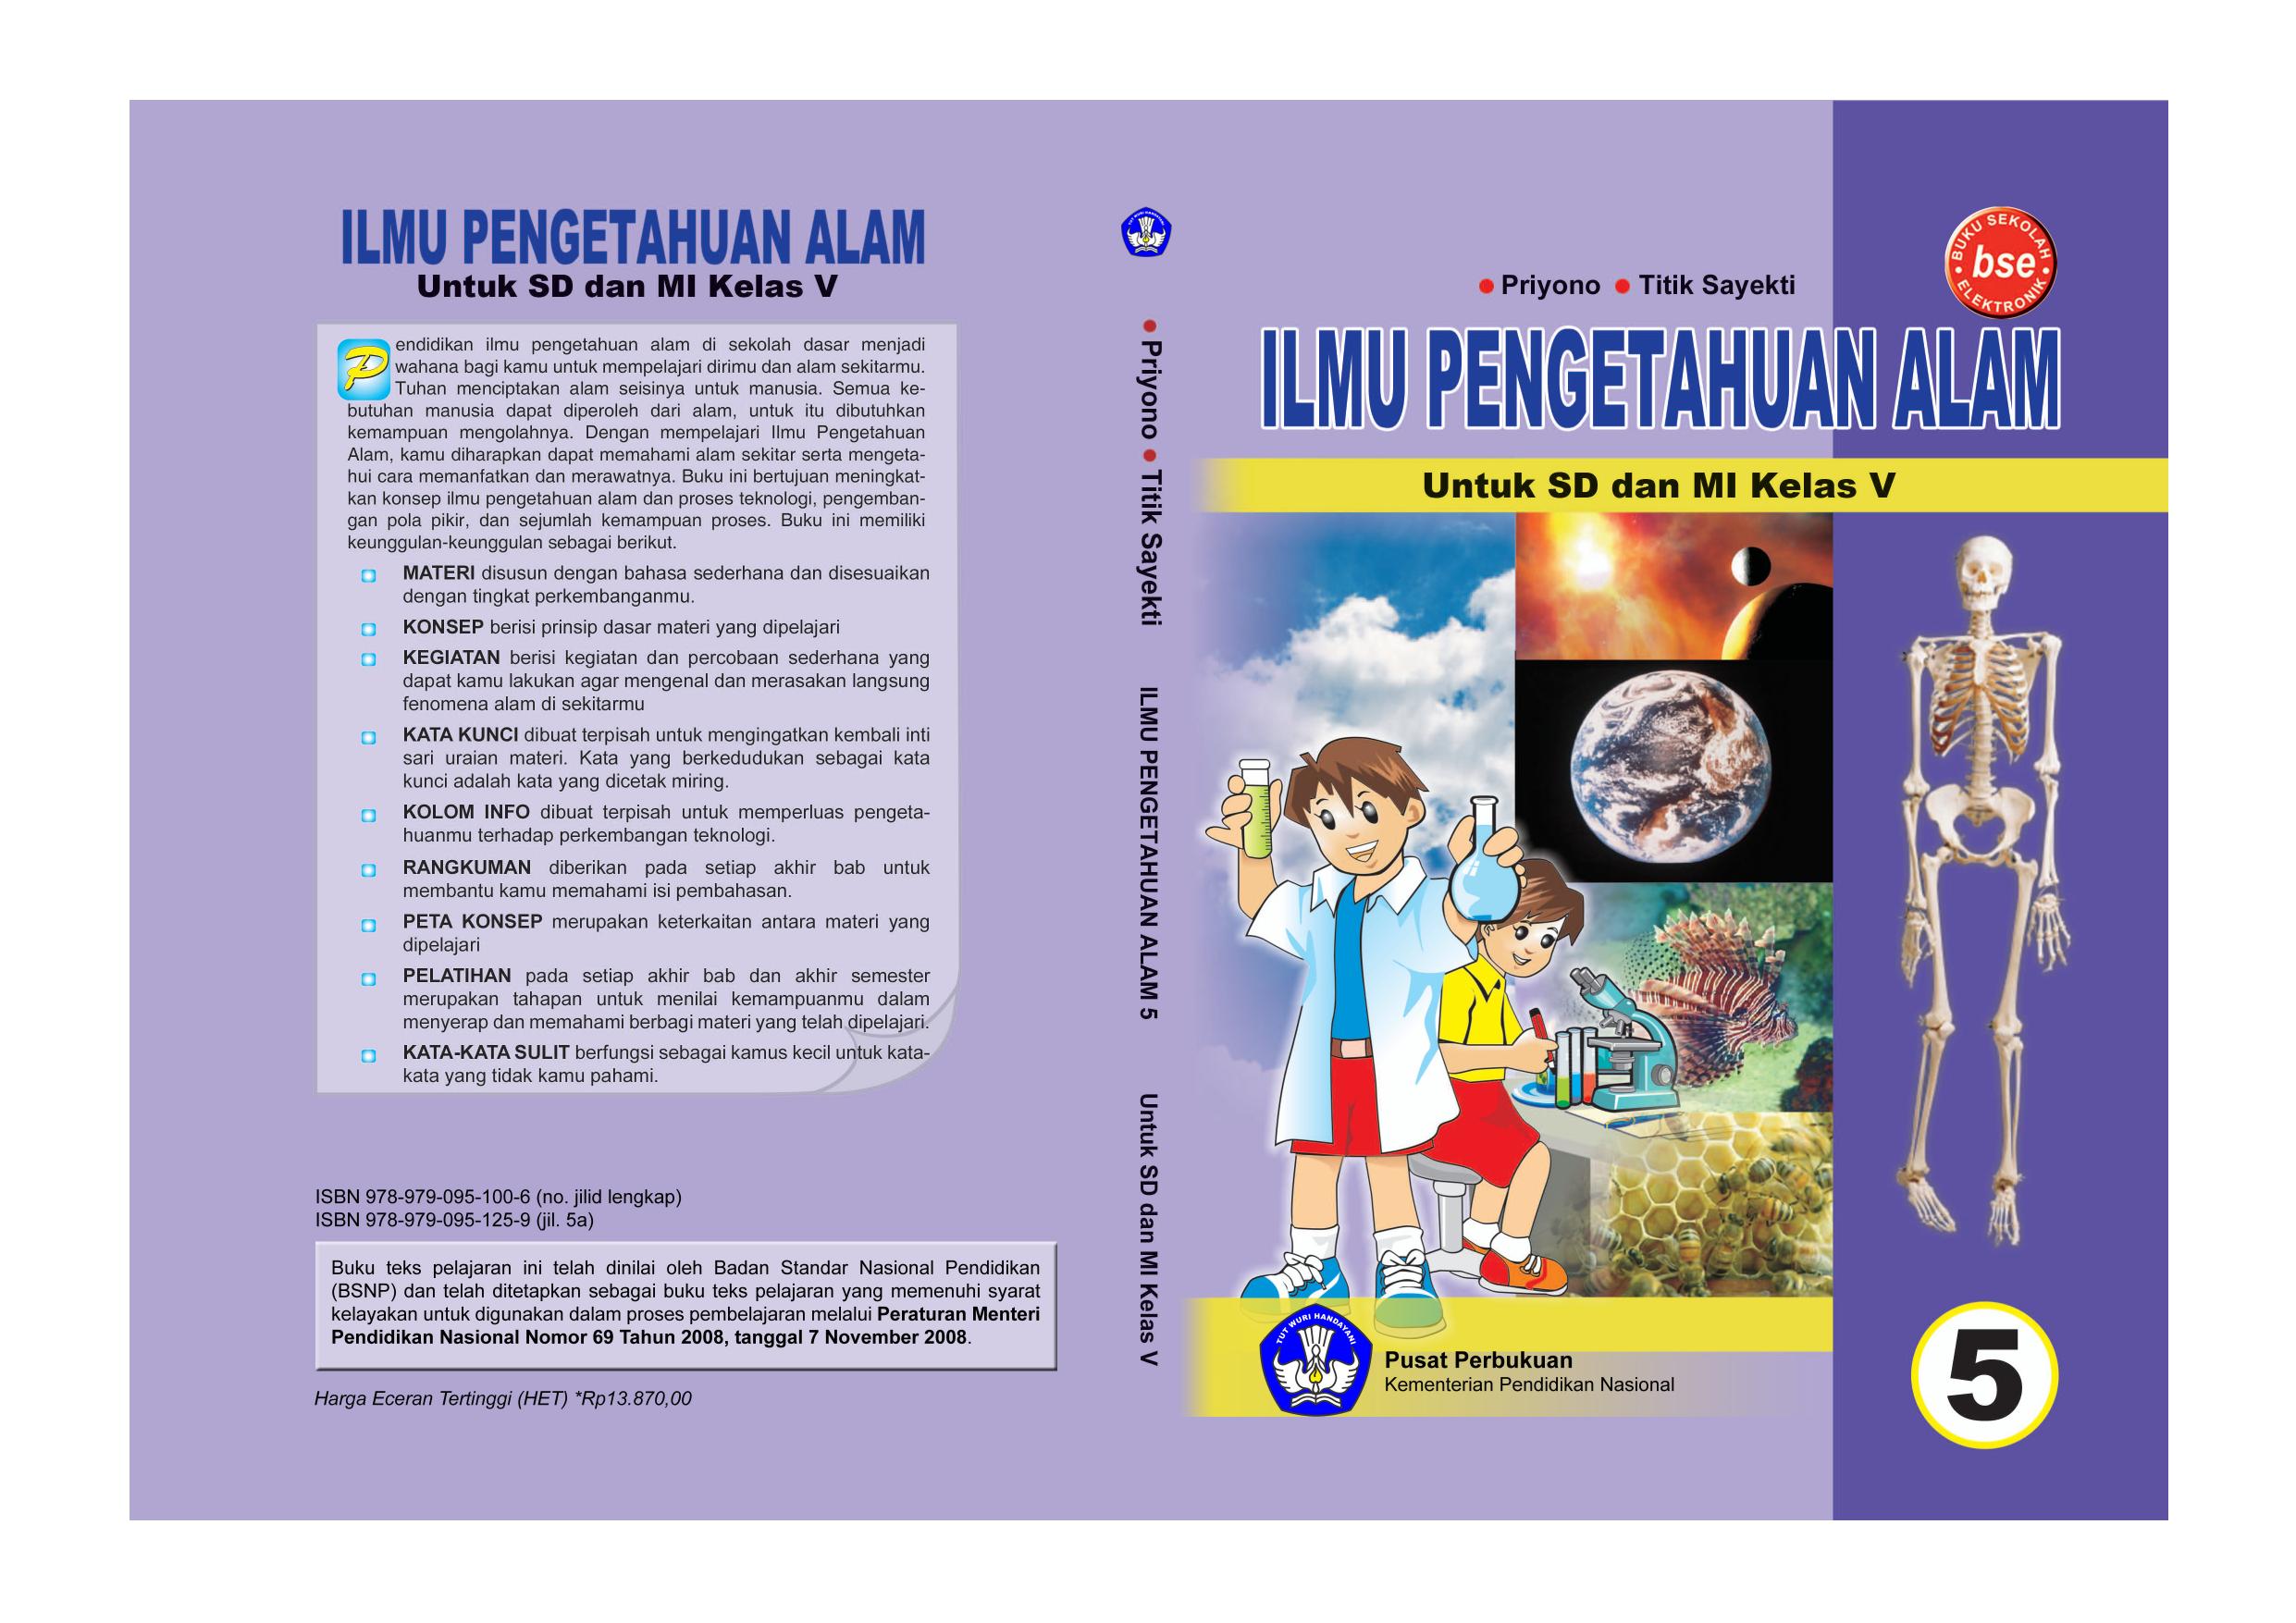 Ilmu Pengetahuan Alam 5 Kelas 5 Priyono Titik Sayekti 2010